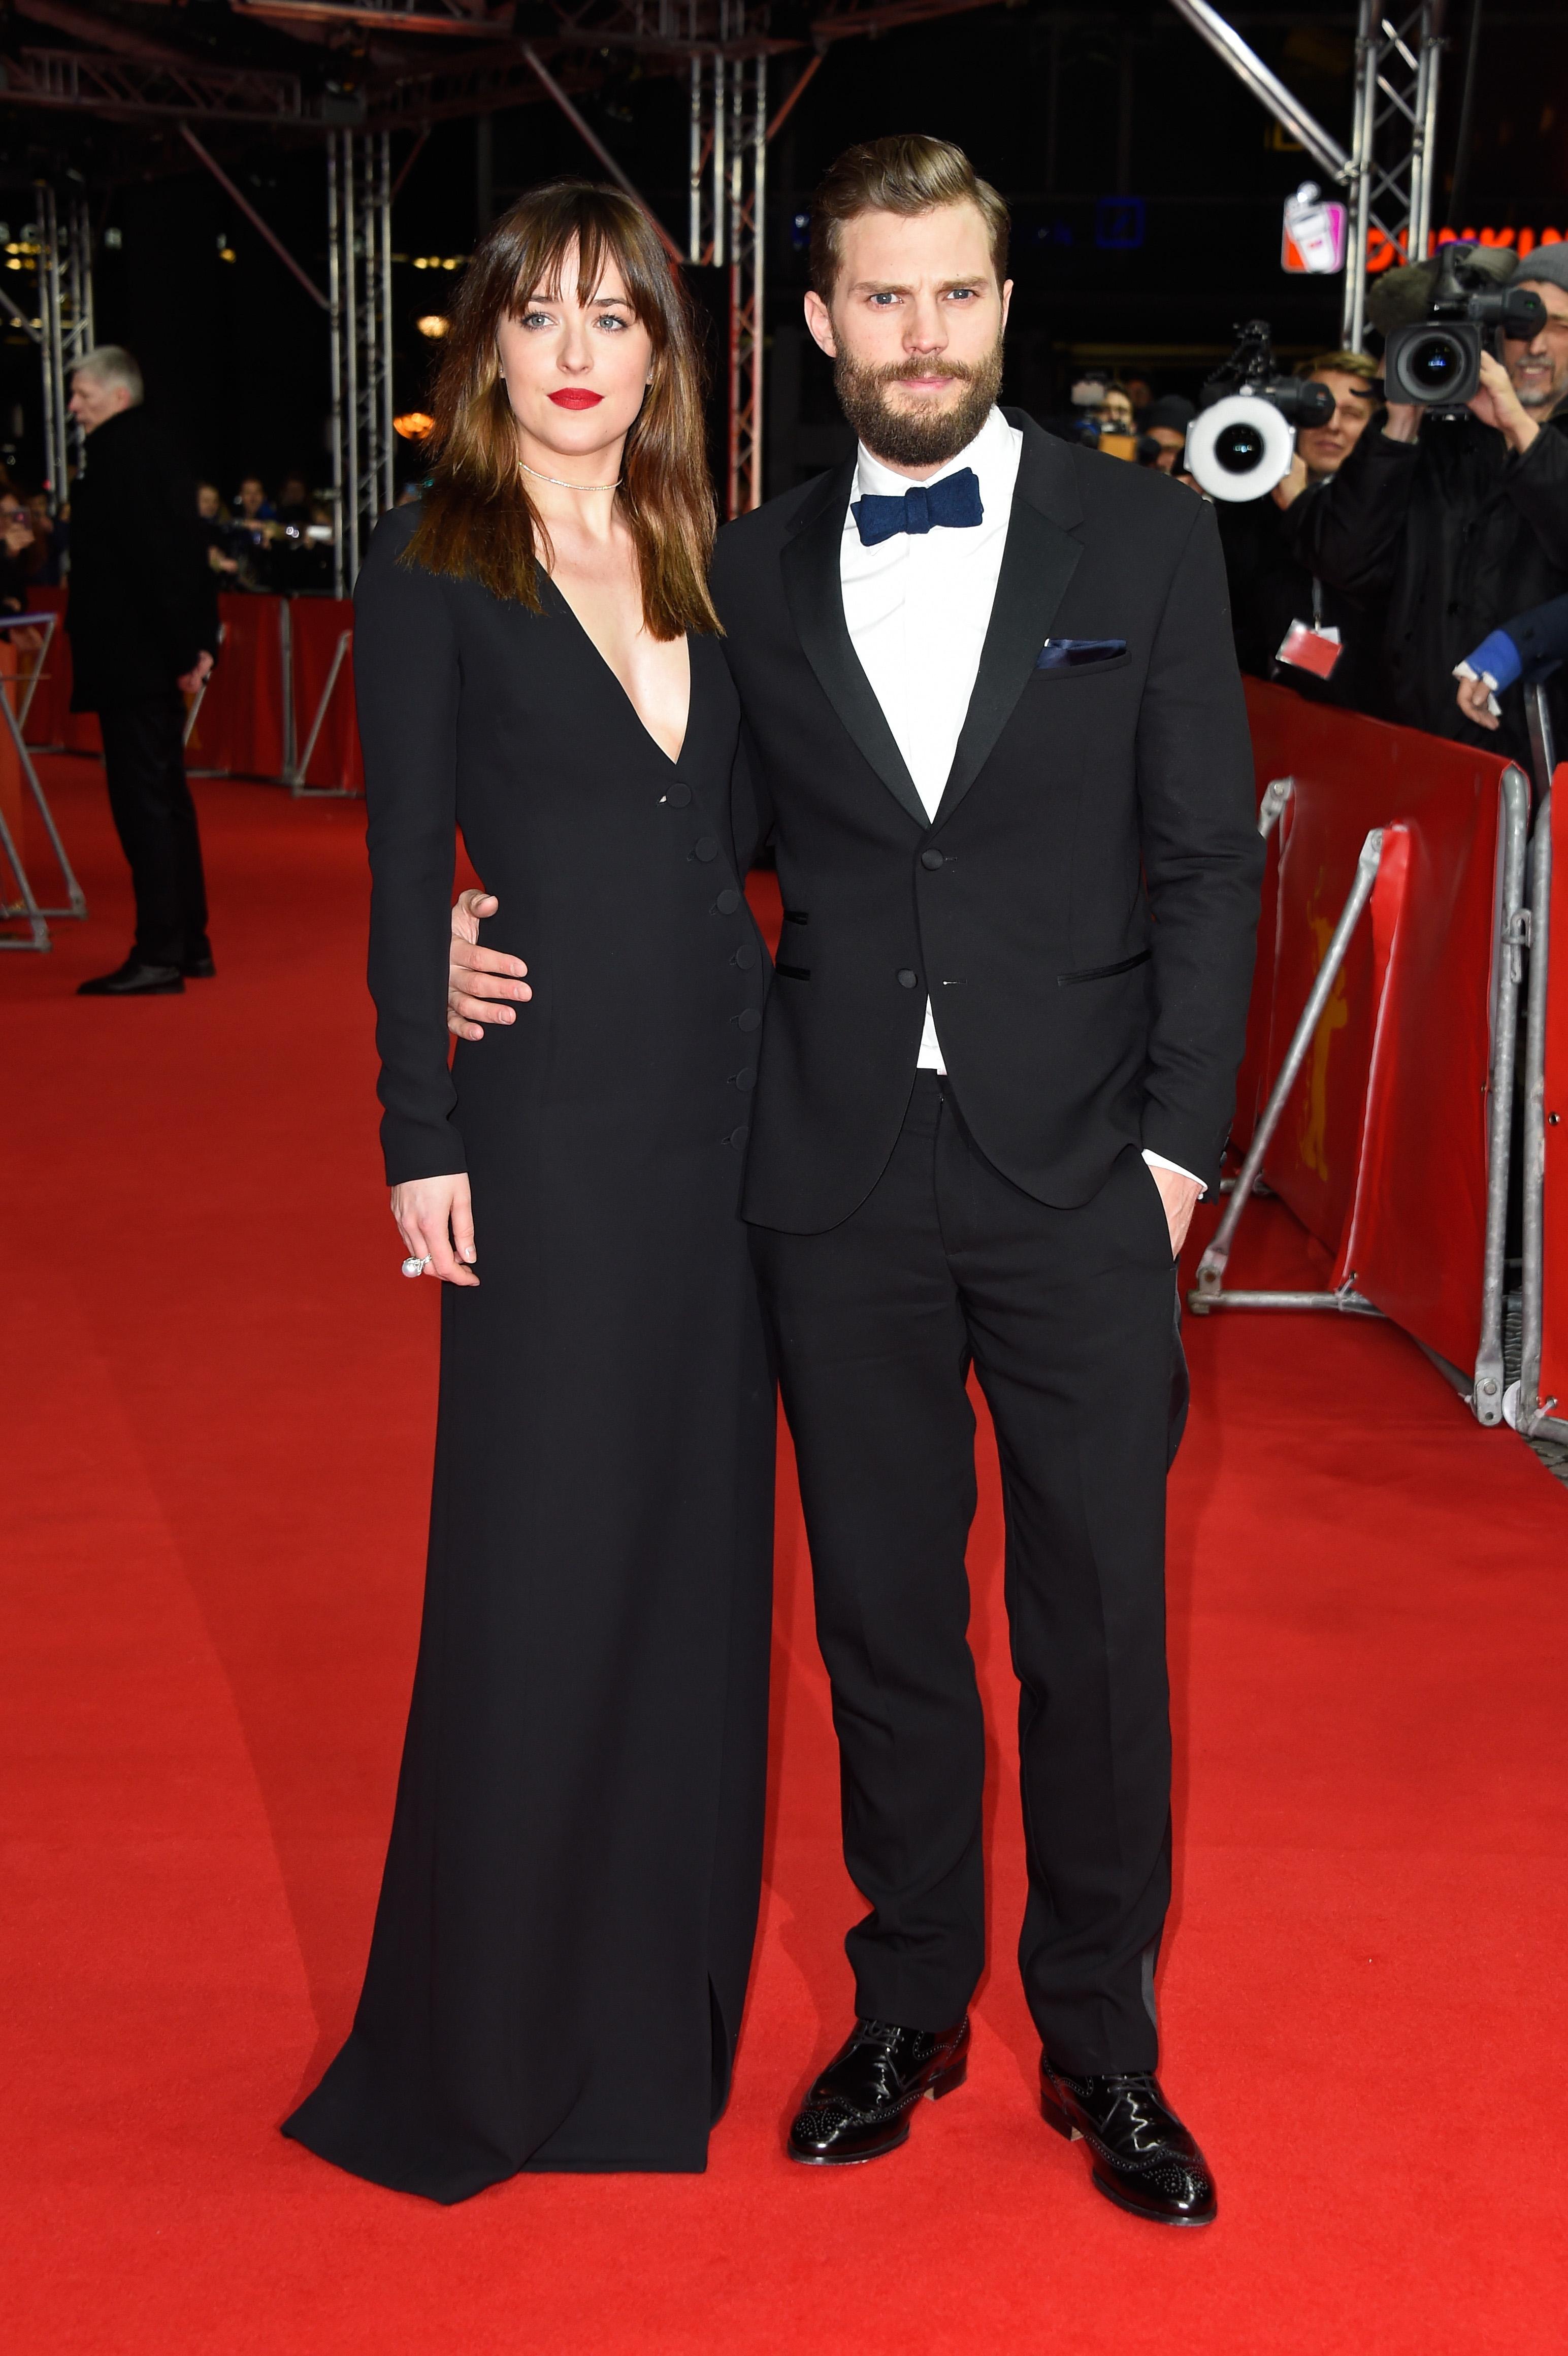 Dakota Johnson and actor Jamie Dornan